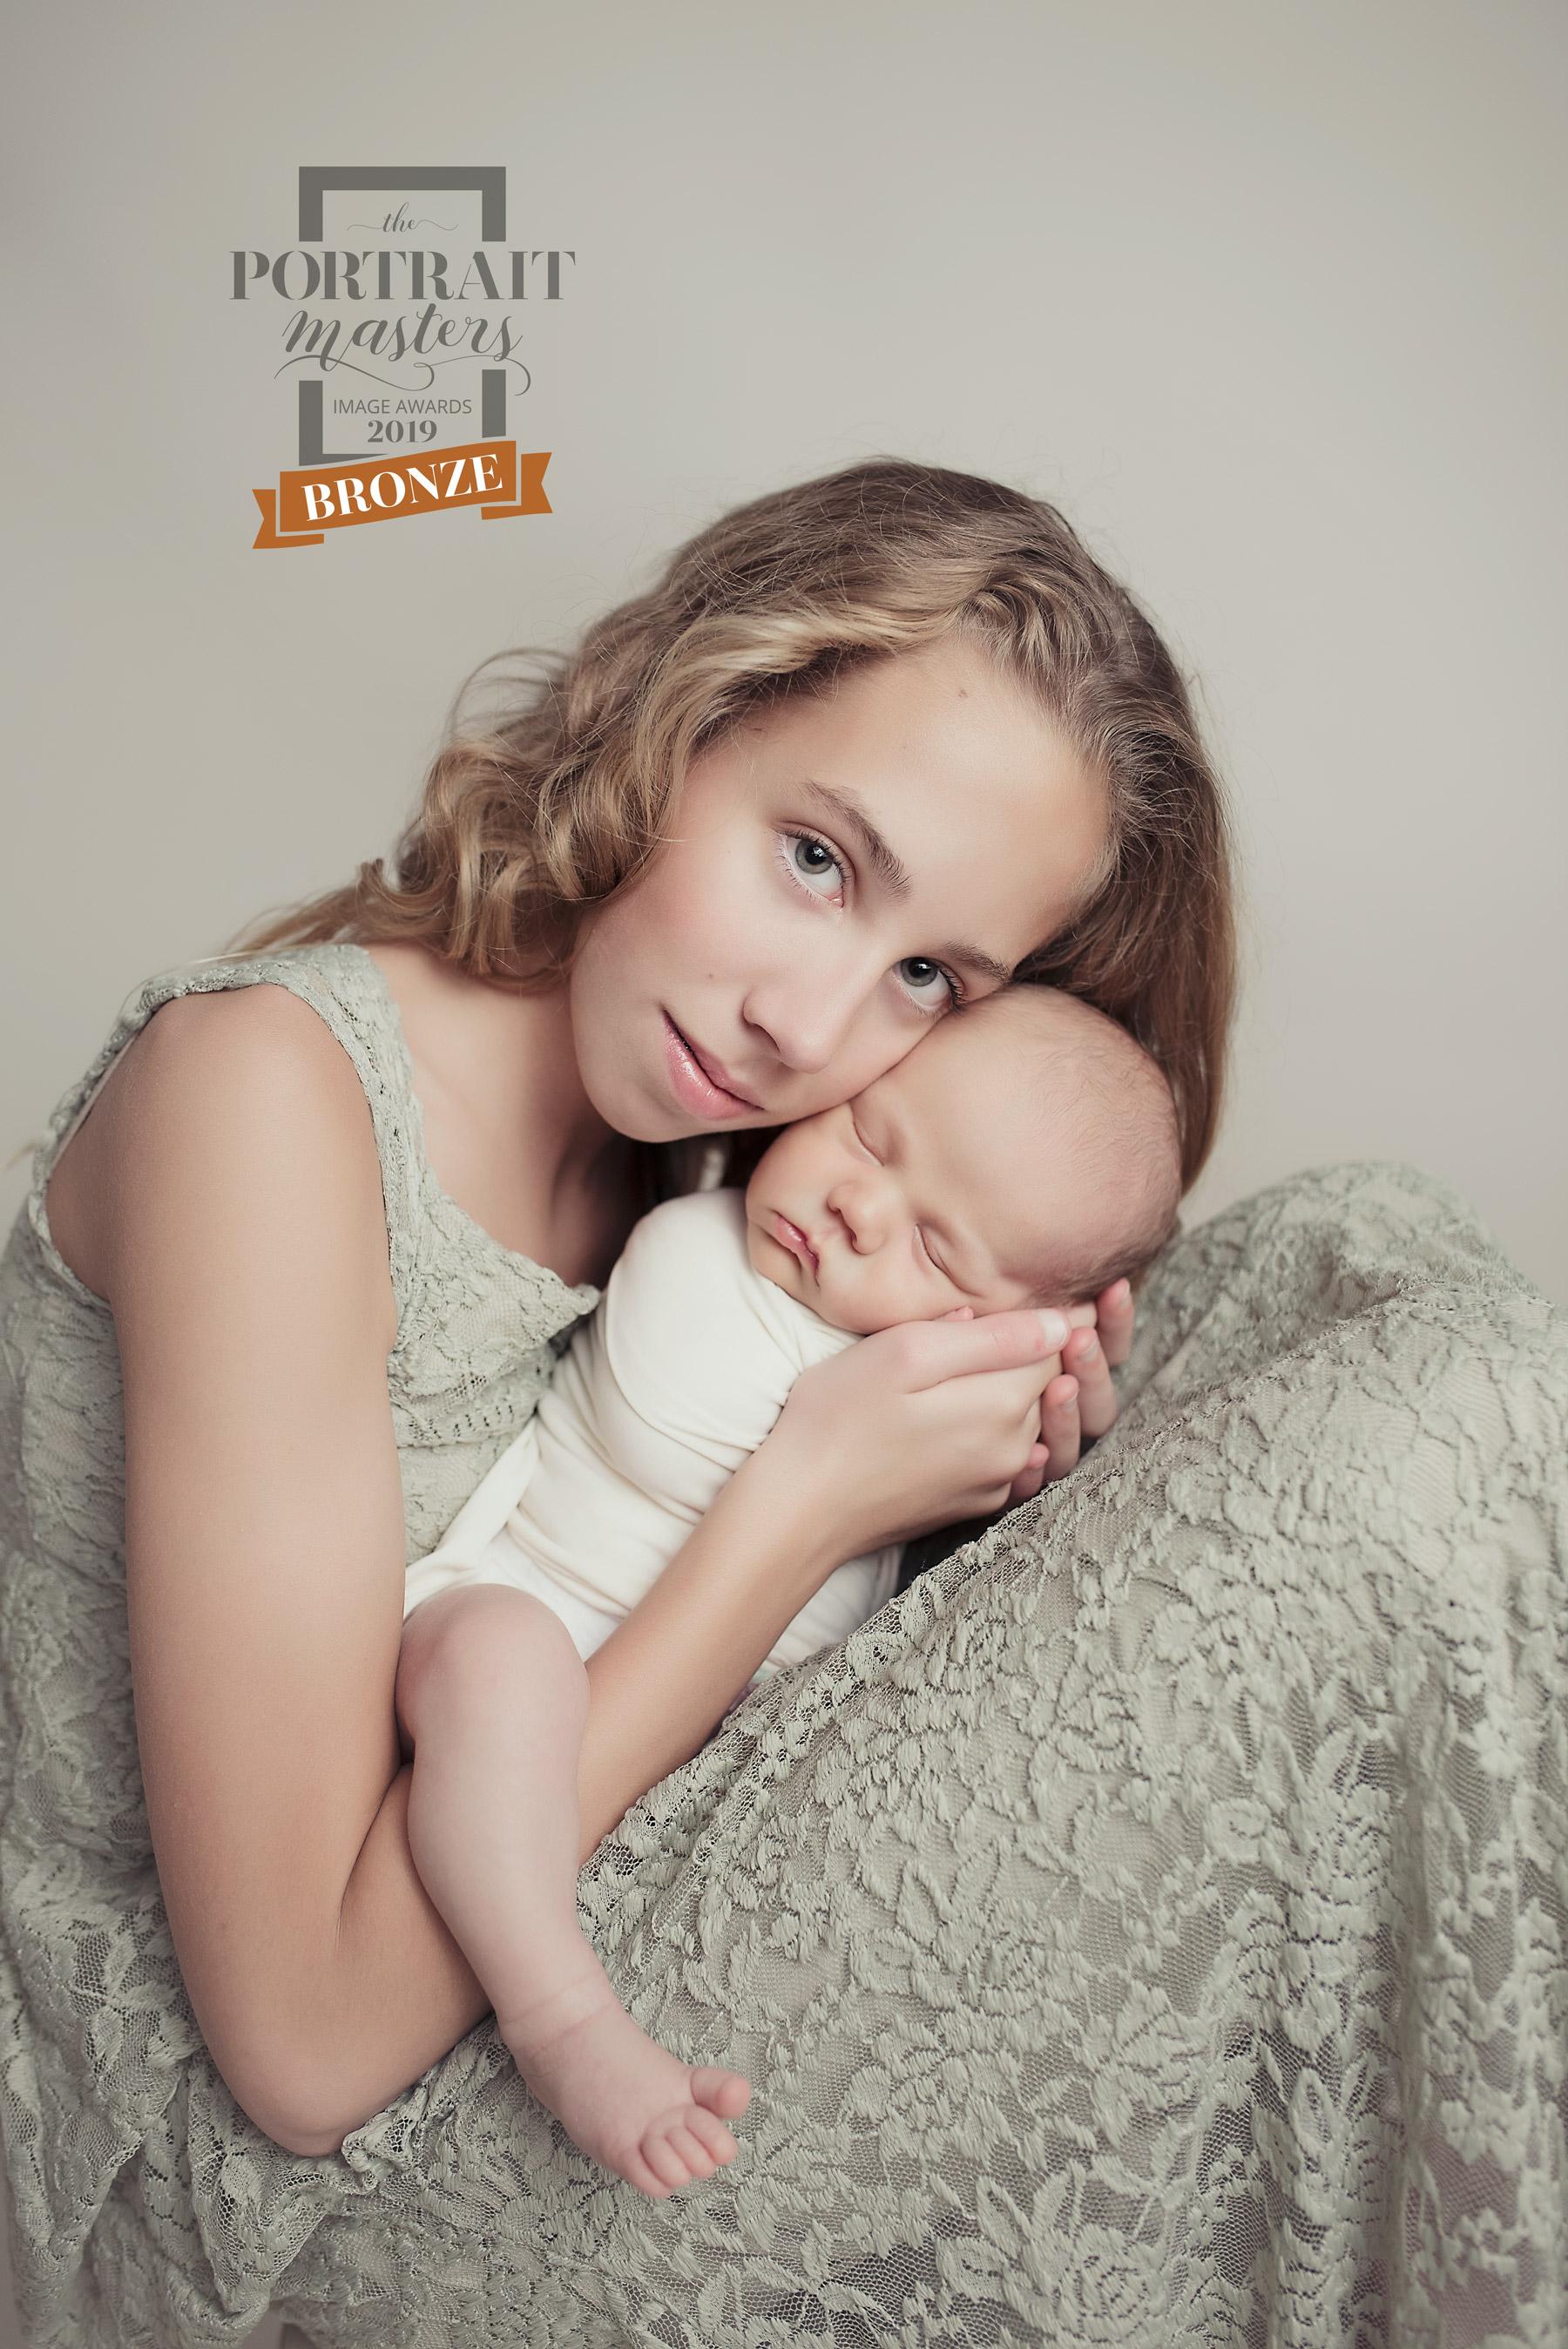 Frisco Newborn Photographer, CLJ Photography, Dallas Newborn Photo Shoot, Luxury Portrait Studio Dallas, Best Frisco Newborn Photographer, Heirloom Portraits Dallas